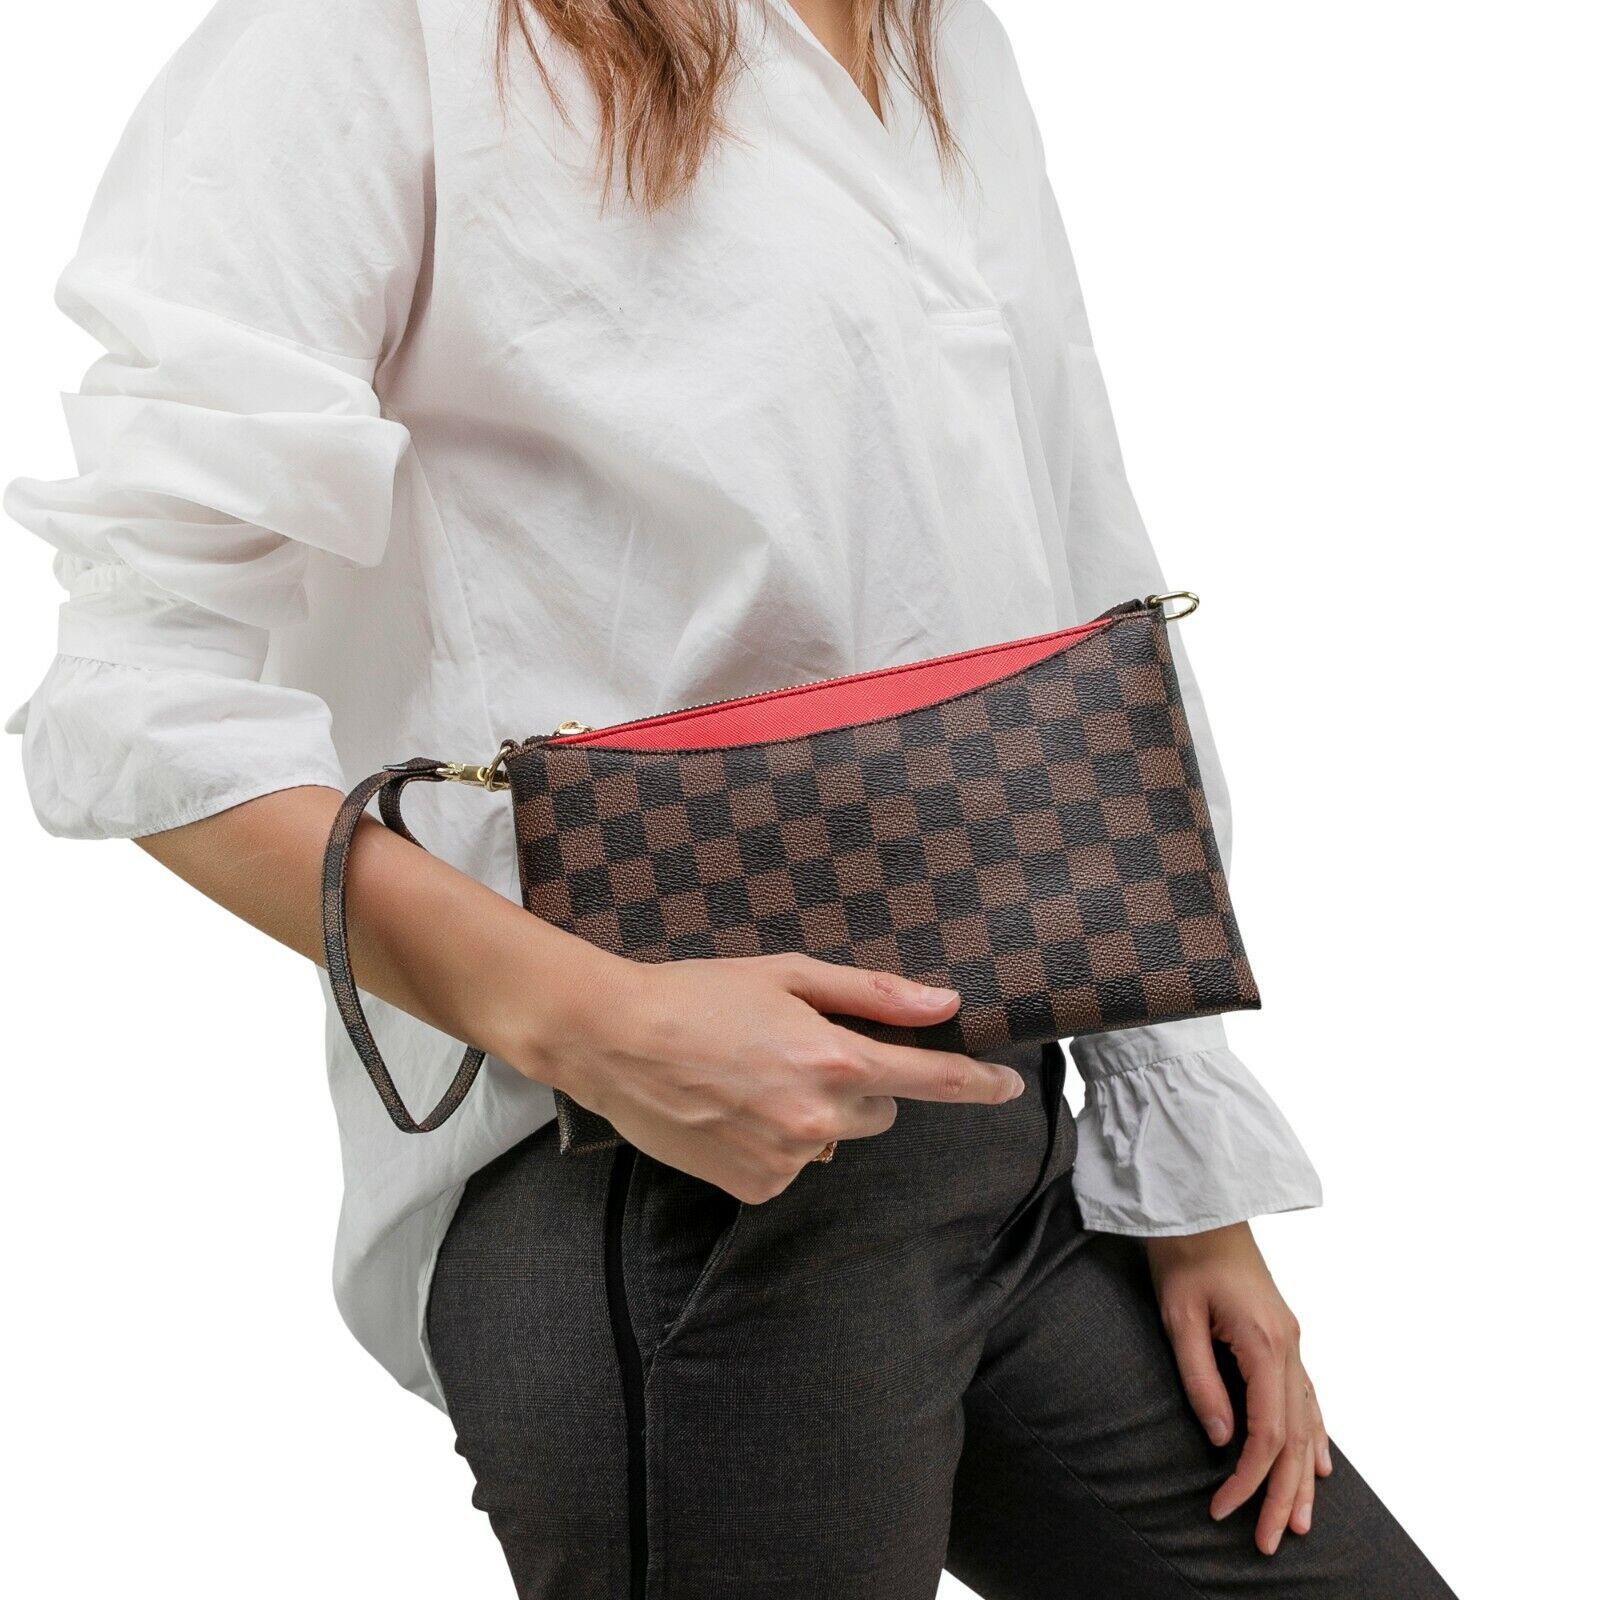 luxury checkered crossbody bag wristlet clutch leather